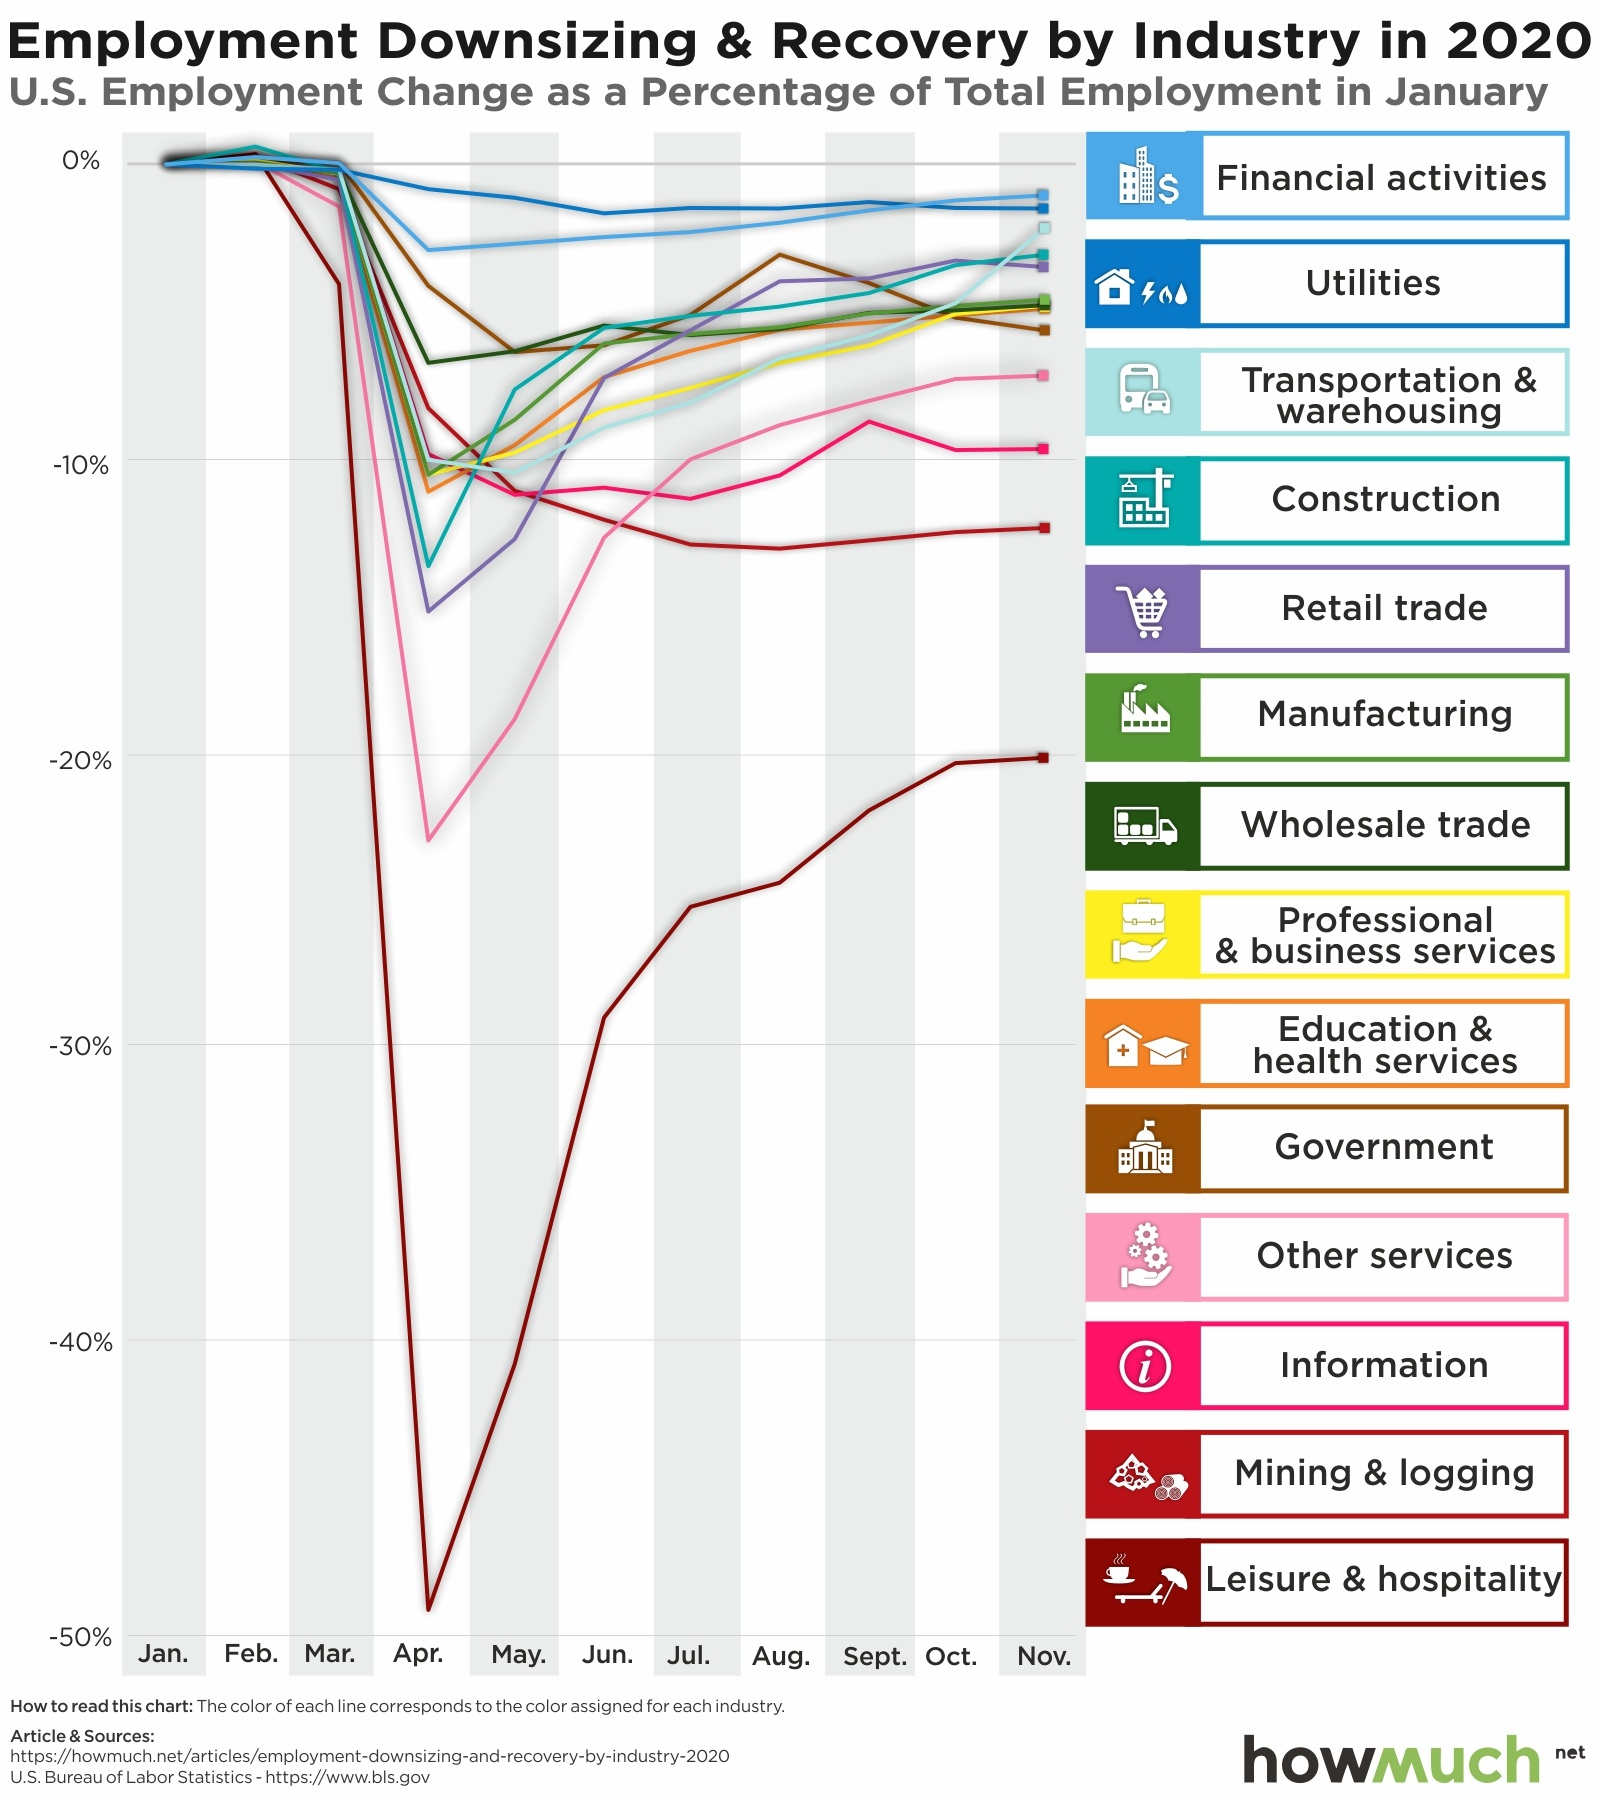 US Employment Downsizing